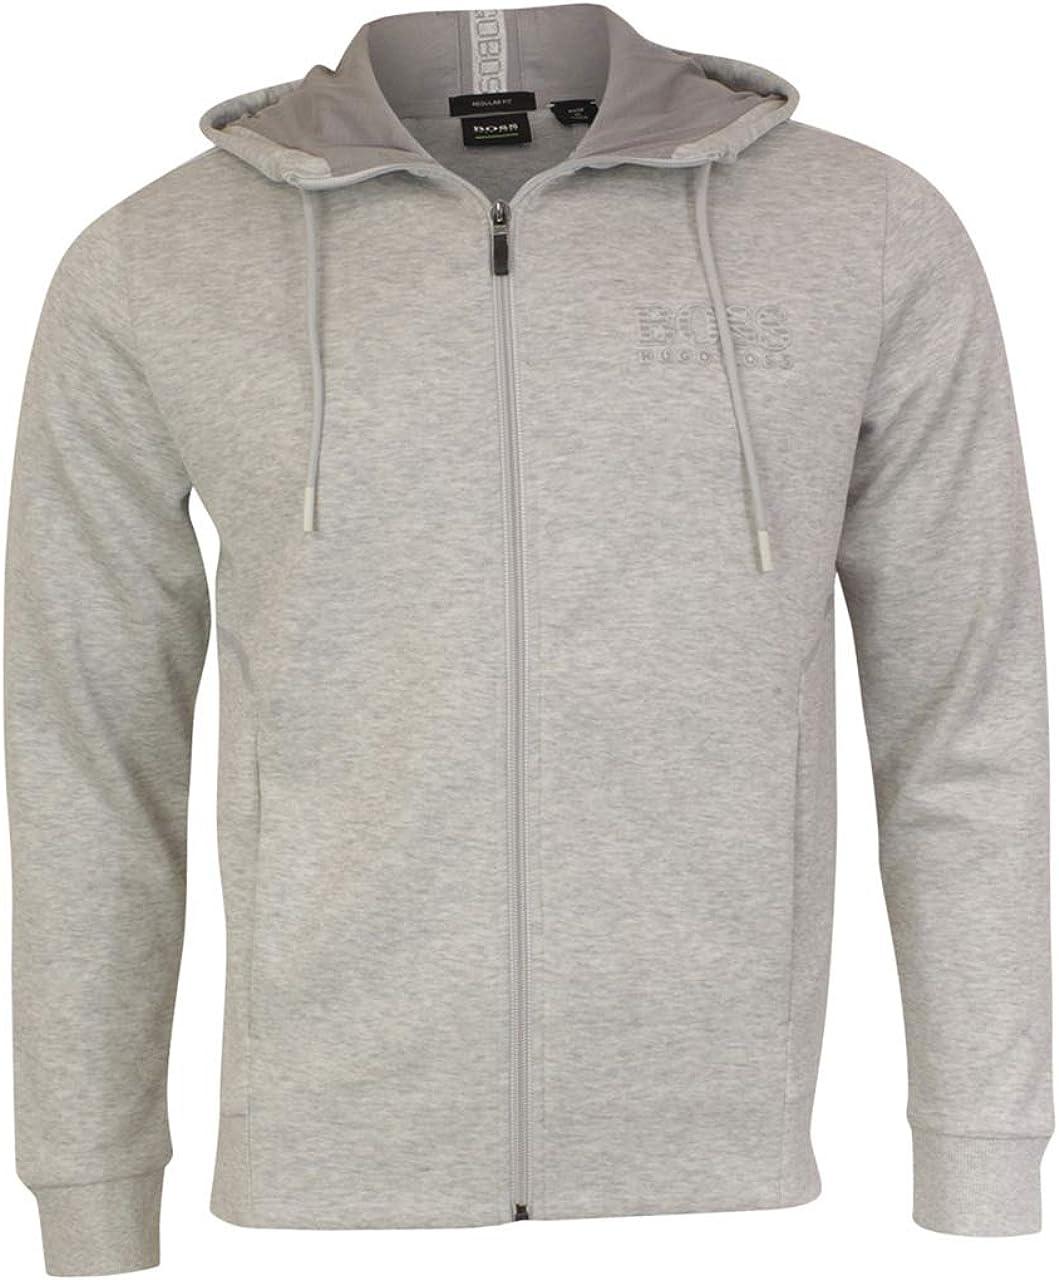 hugo boss grey sweater